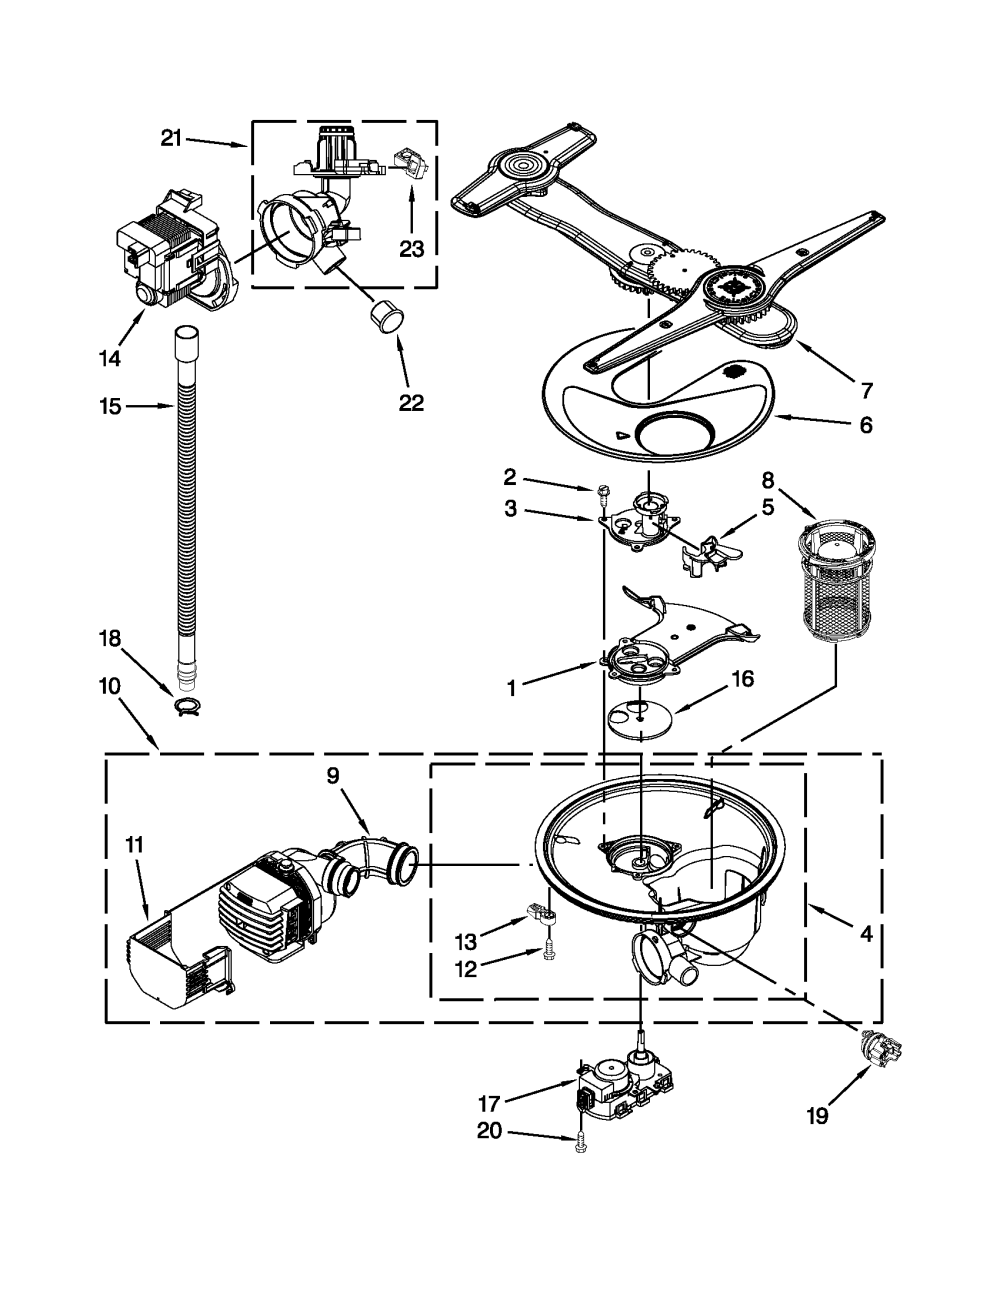 medium resolution of kenmore elite dishwasher schematic wiring diagram blog mix looking for kenmore elite model 66513963k013 dishwasher repair